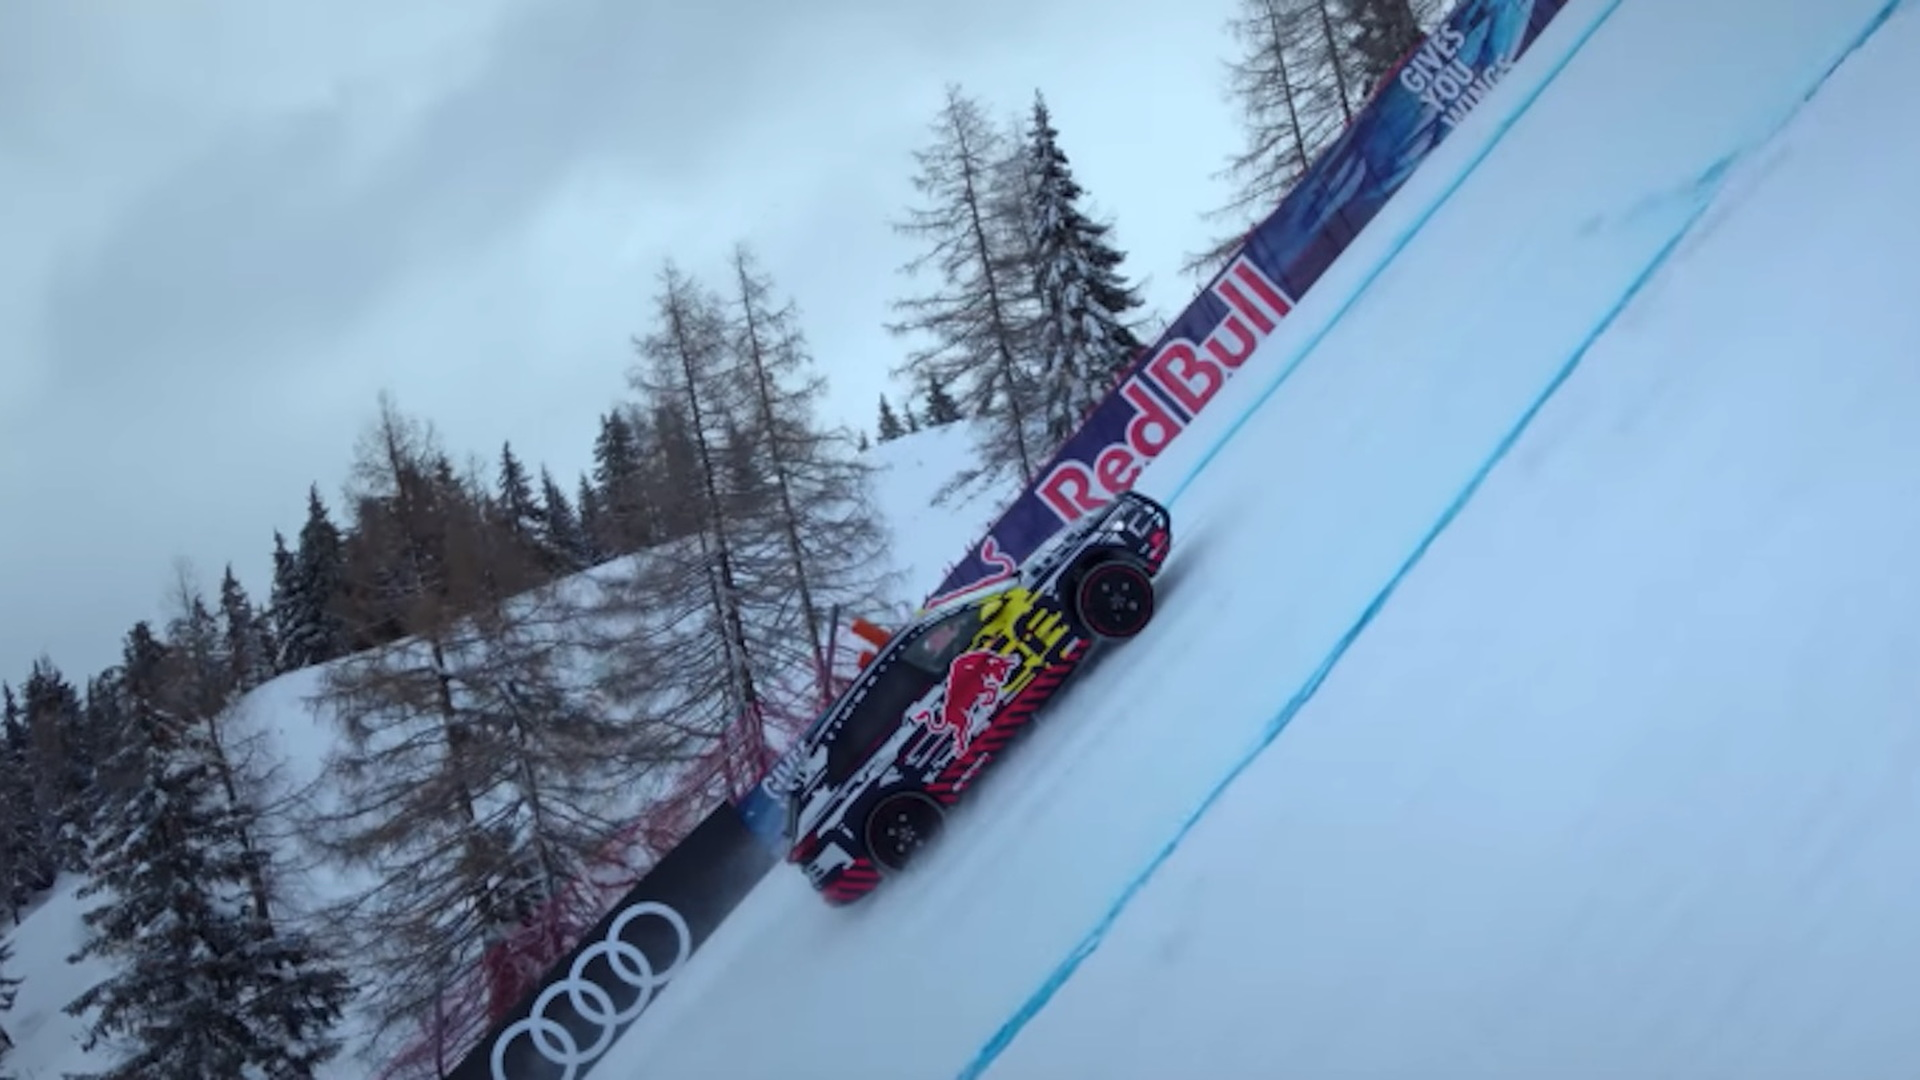 Audi e-tron ski slope ad